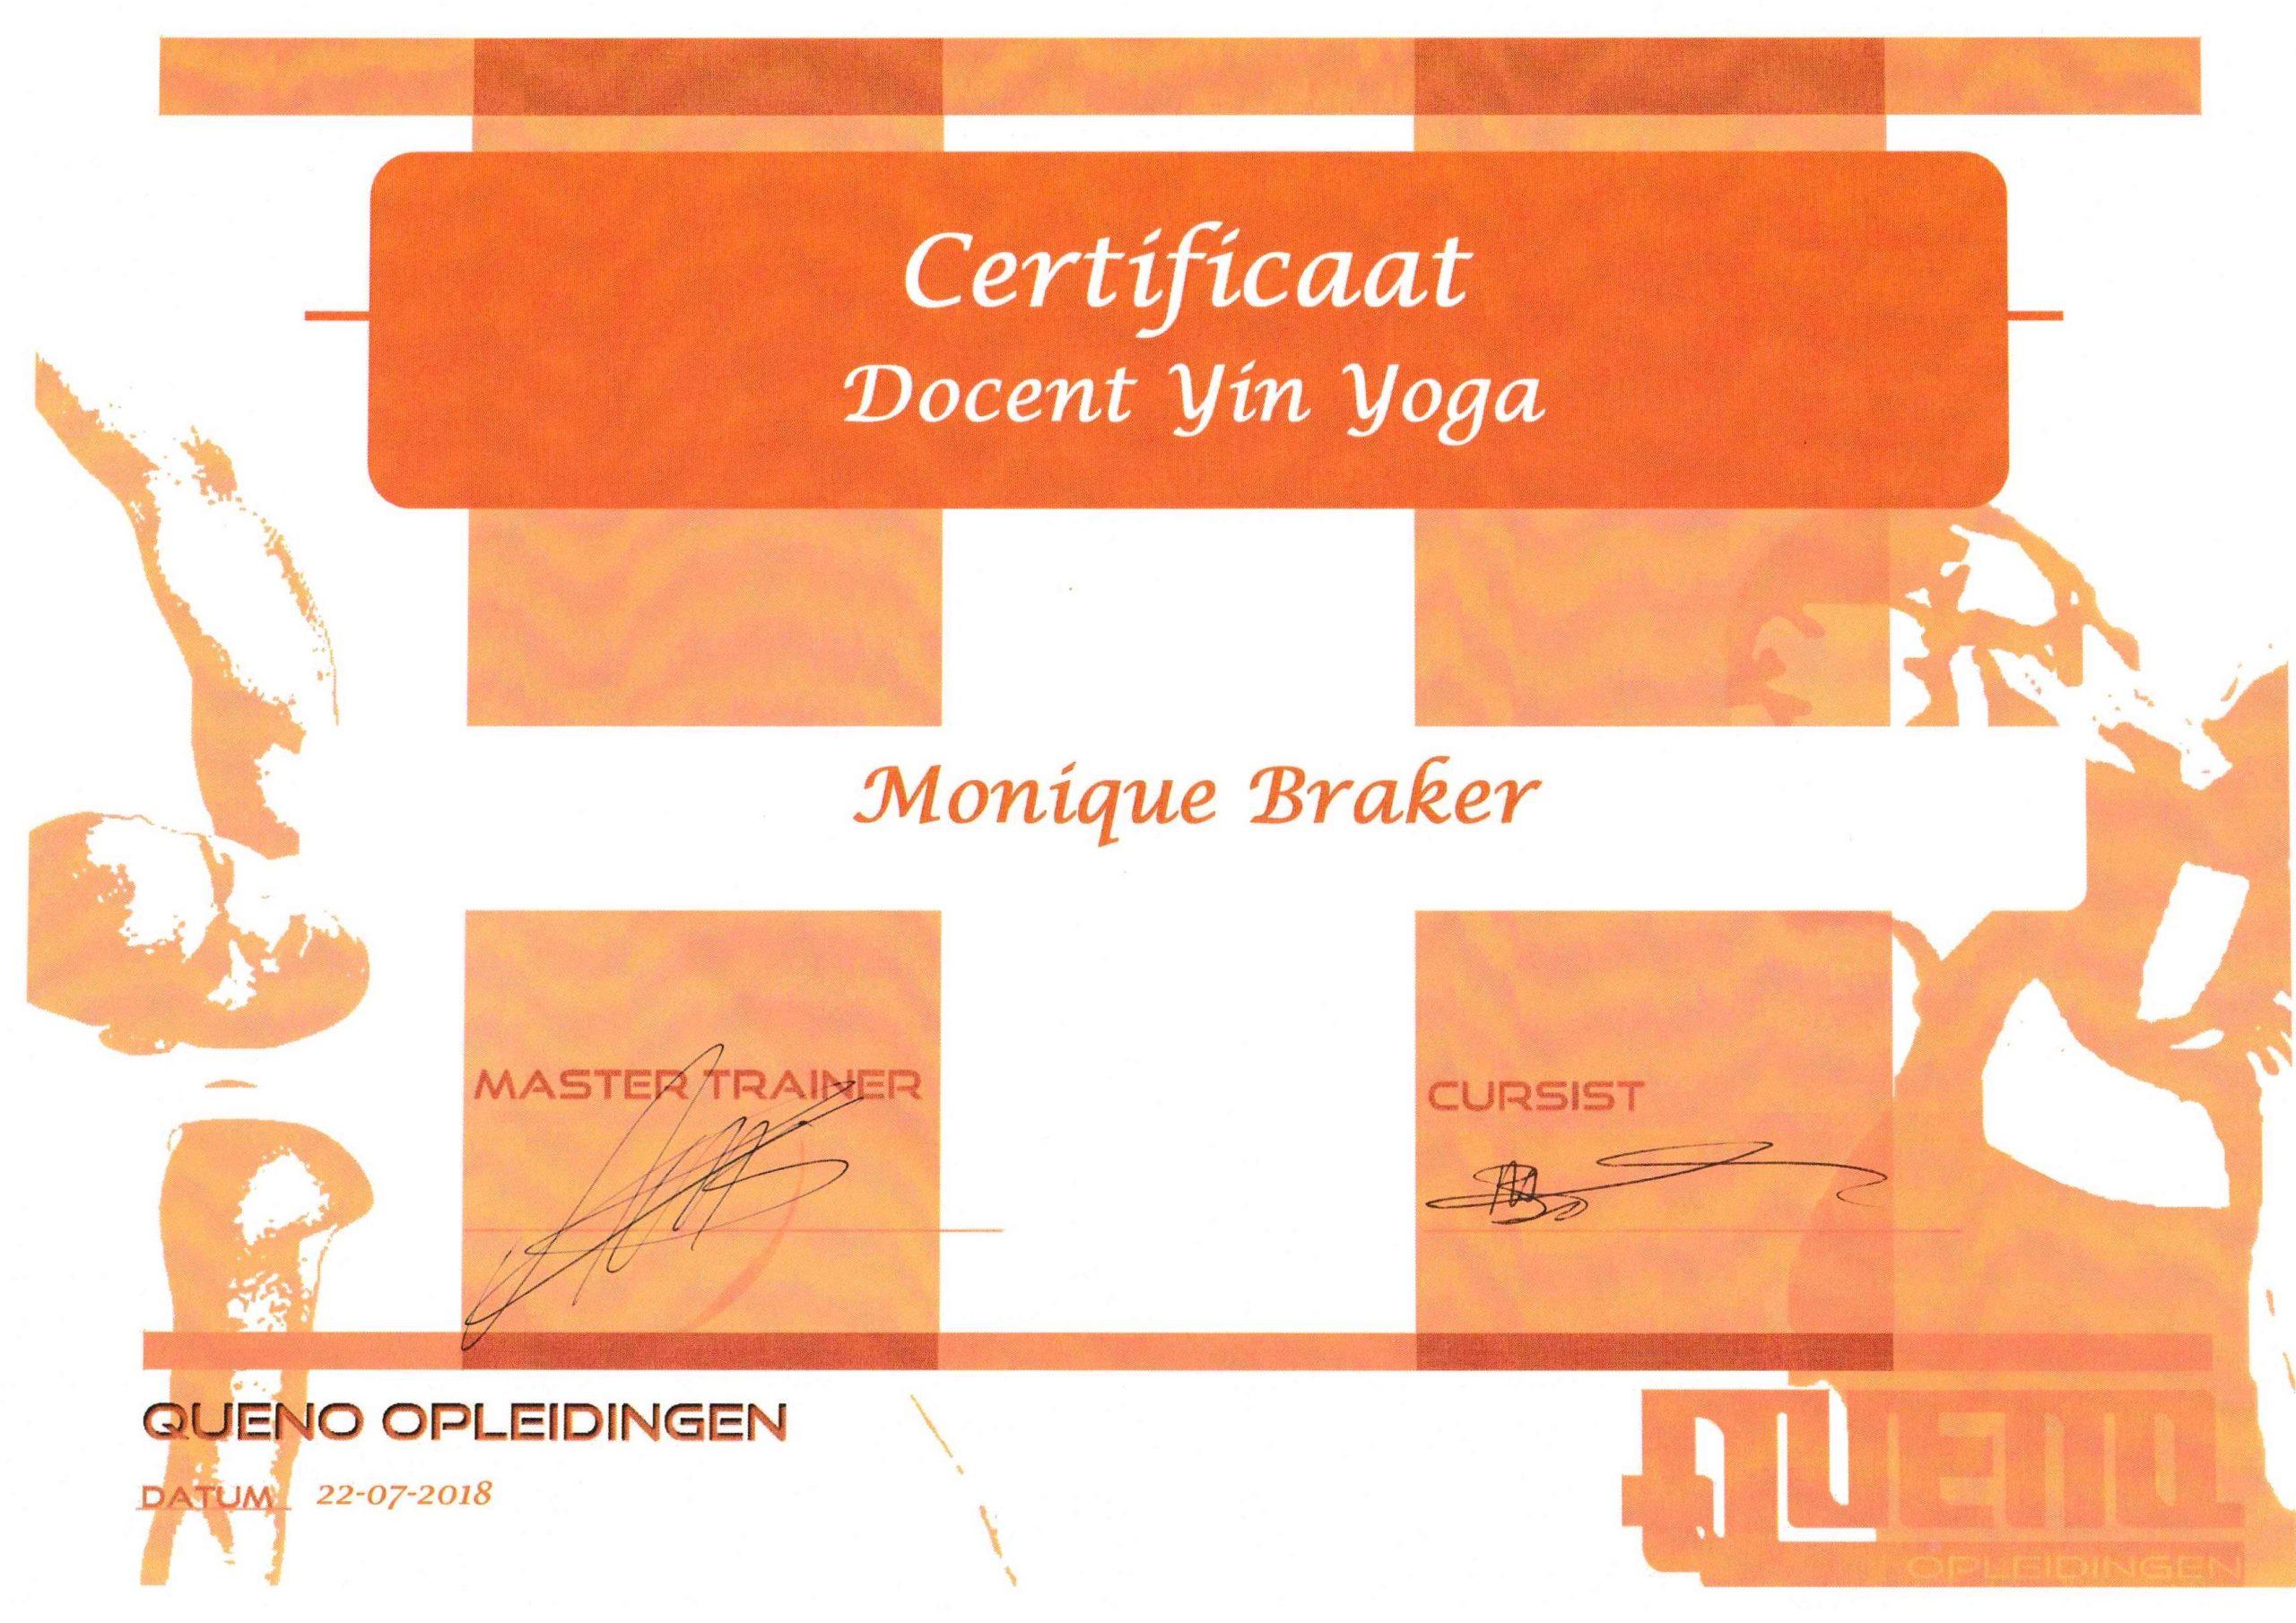 Certificaat Docent Yin Yoga